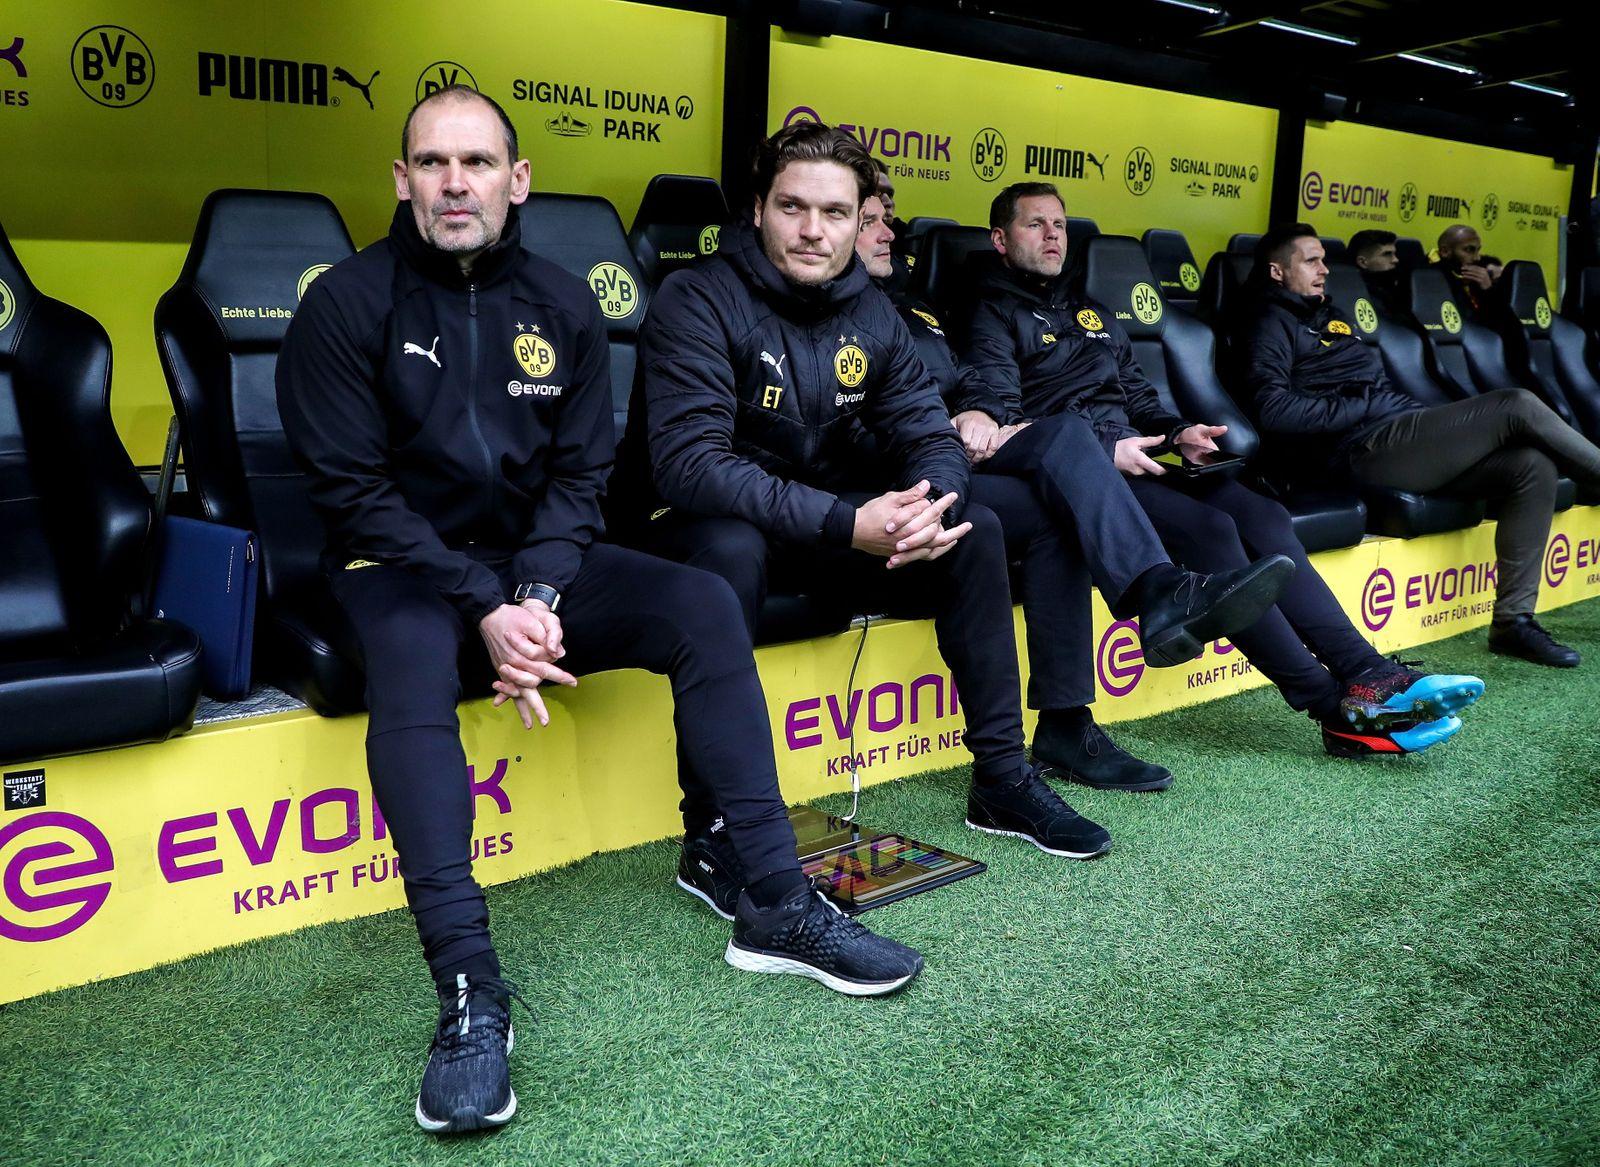 Borussia Dortmund sack Lucien Favre, Germany - 09 Feb 2019